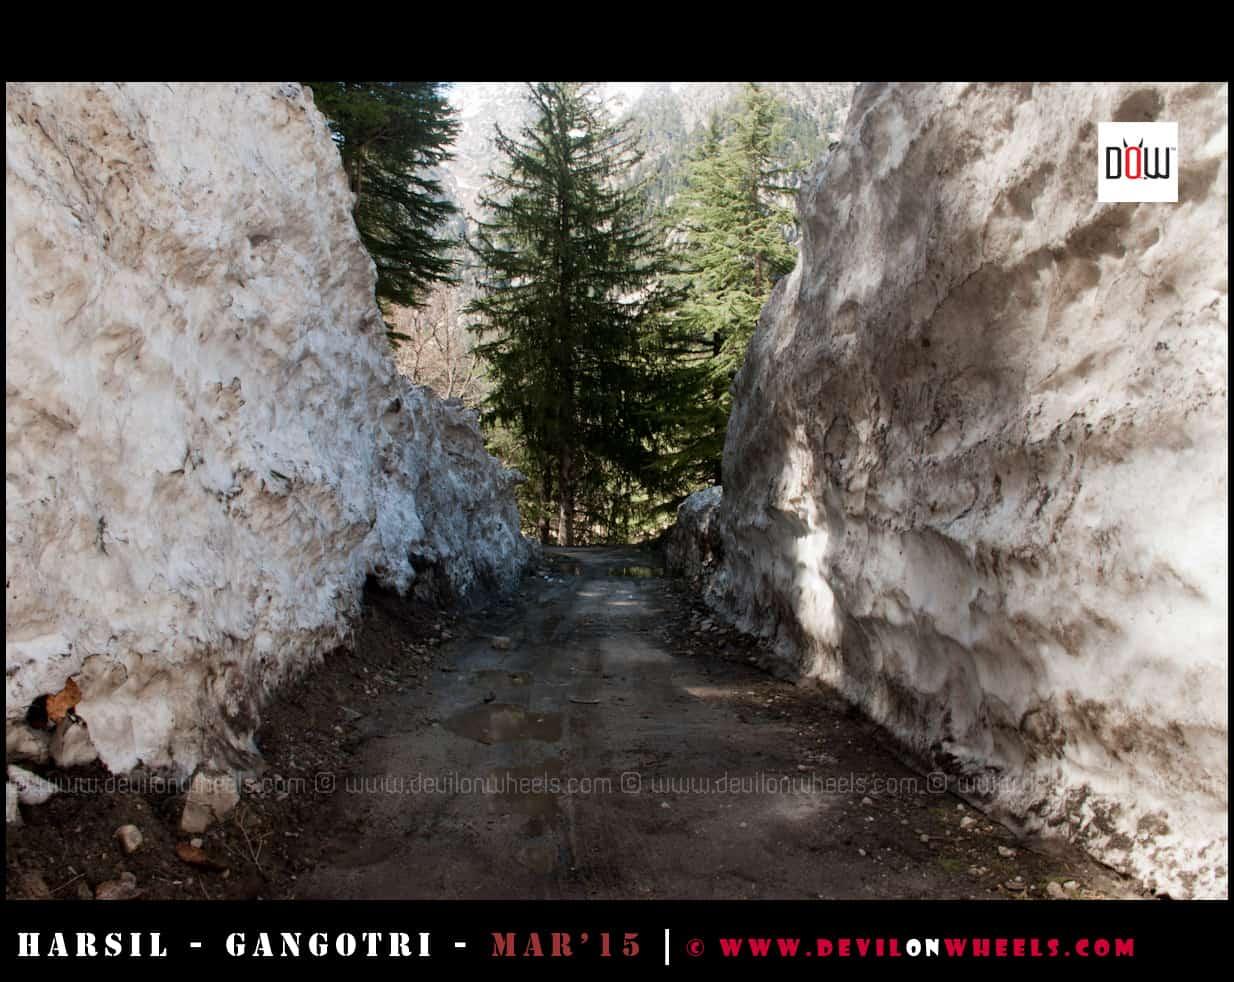 The High Snow Walls near Dharali